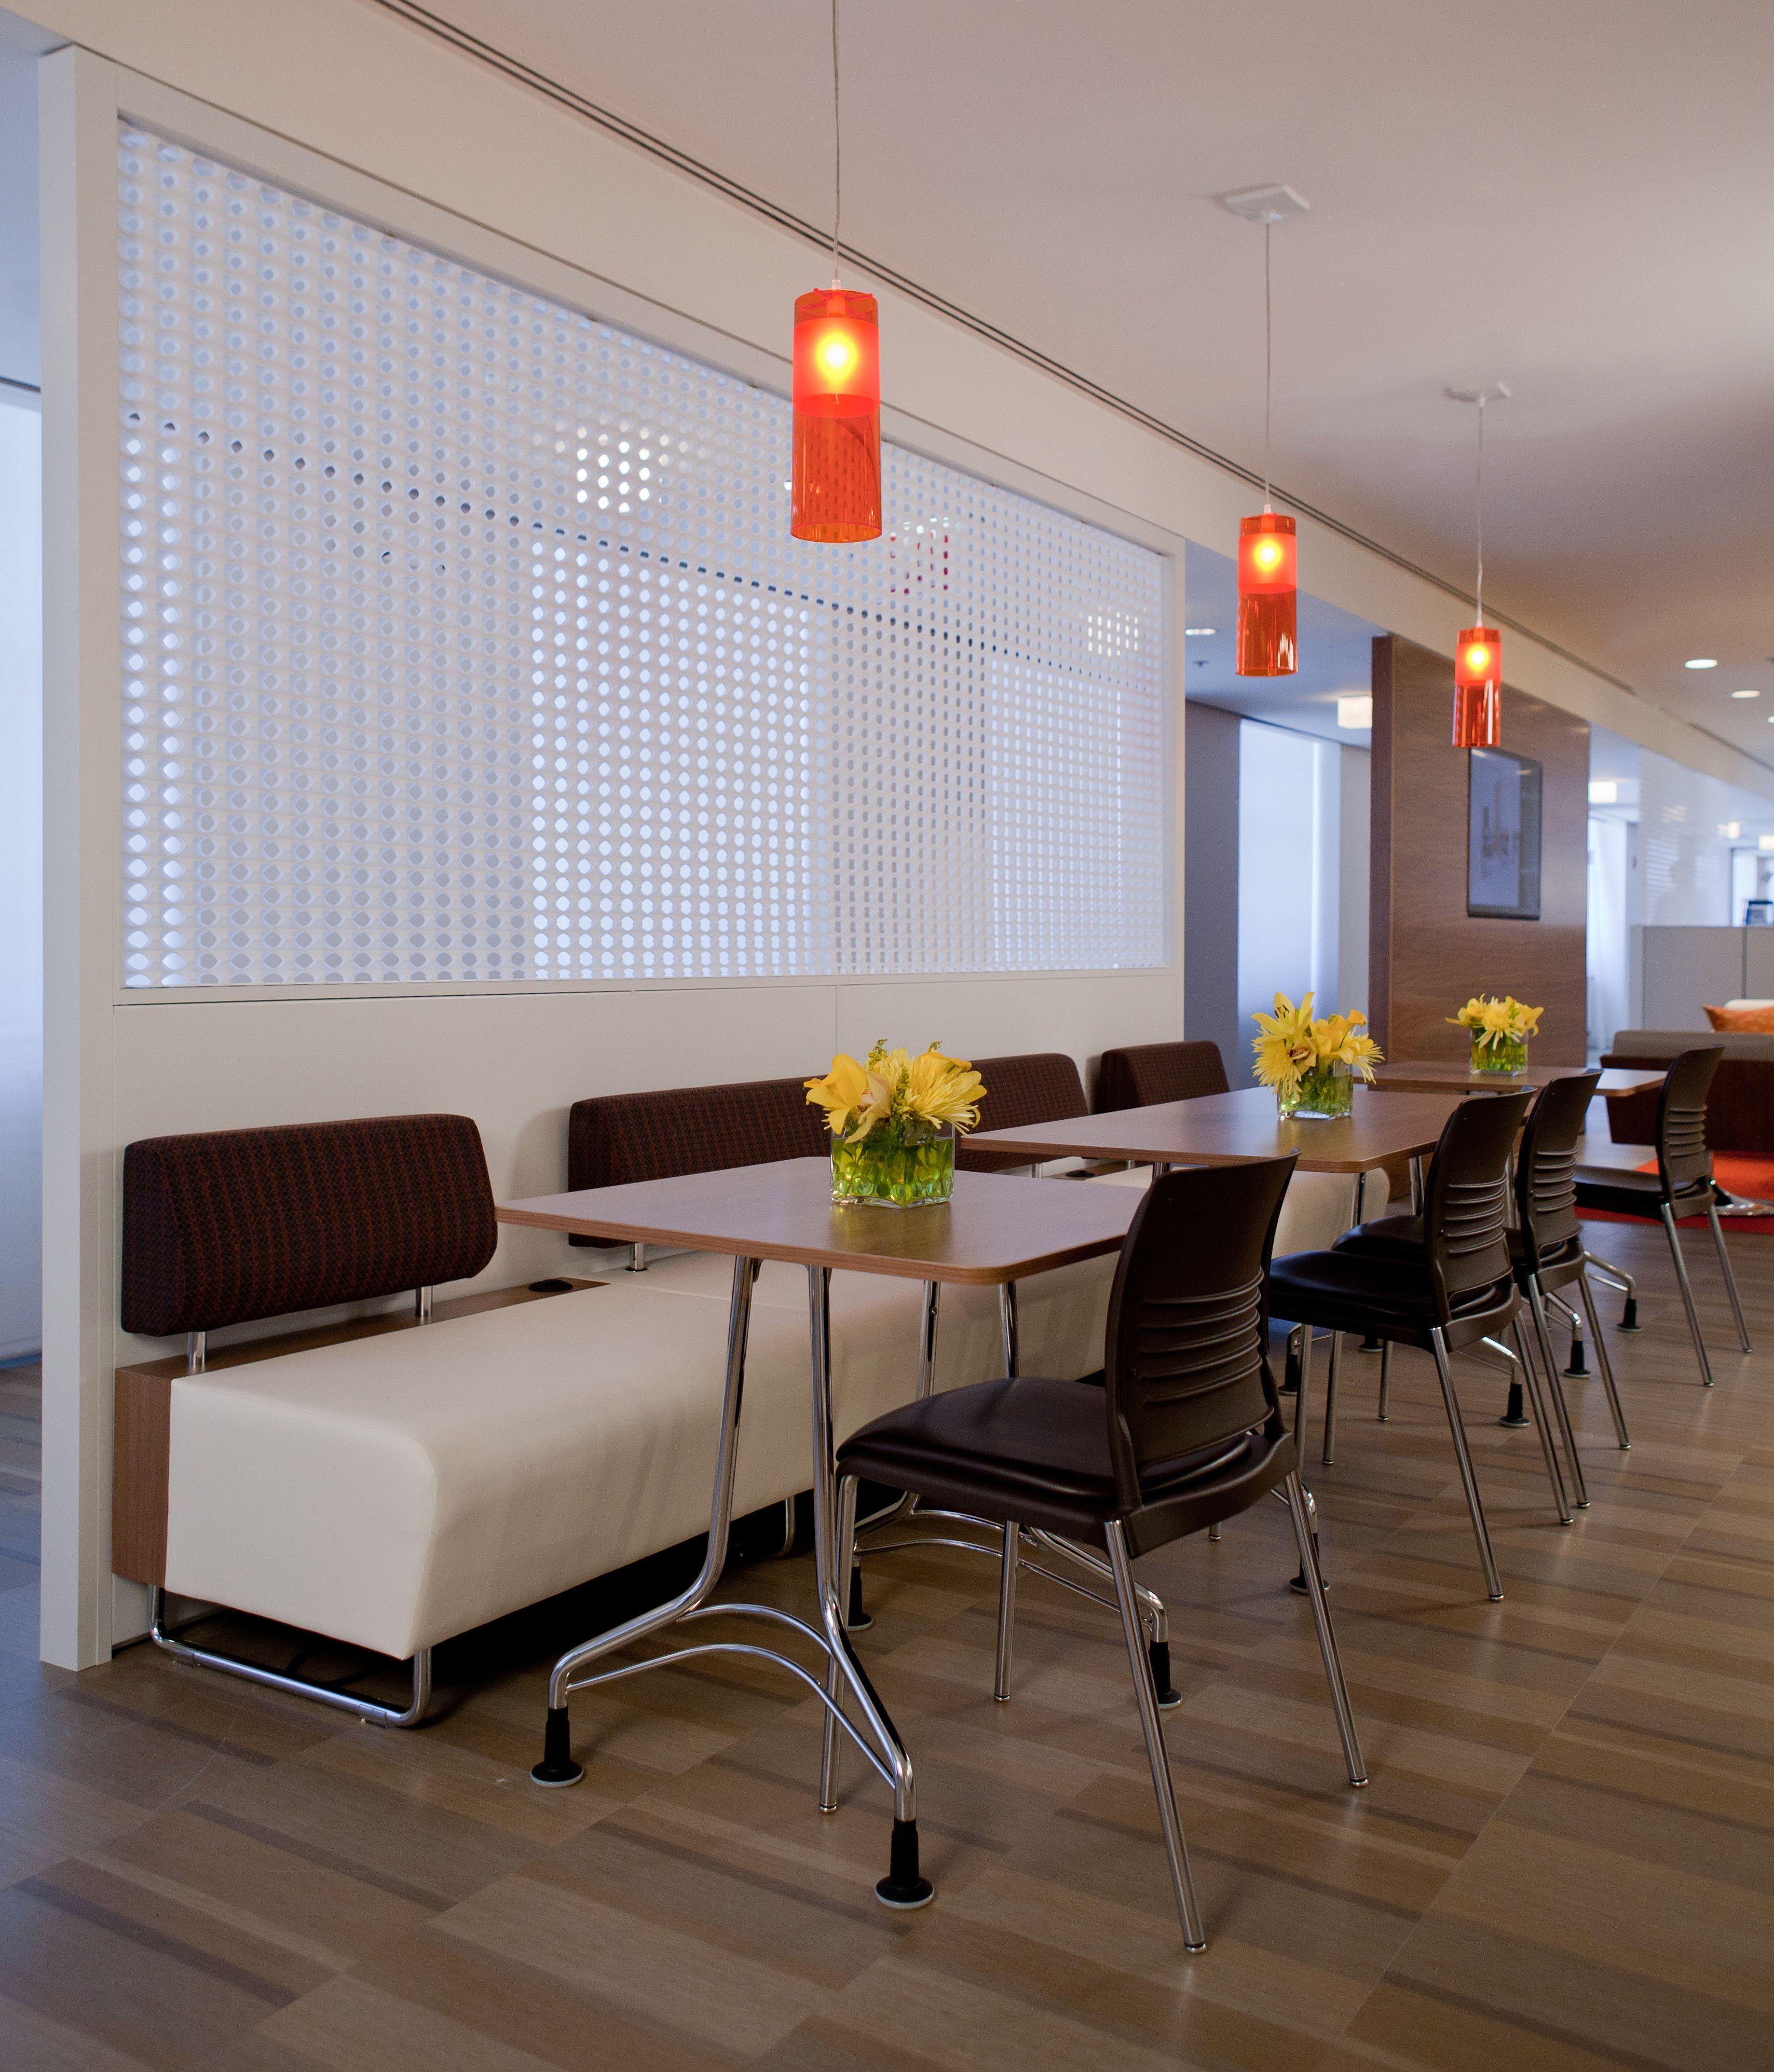 ki strive chair recycled adirondack chairs hub modular lounge enlite table seating